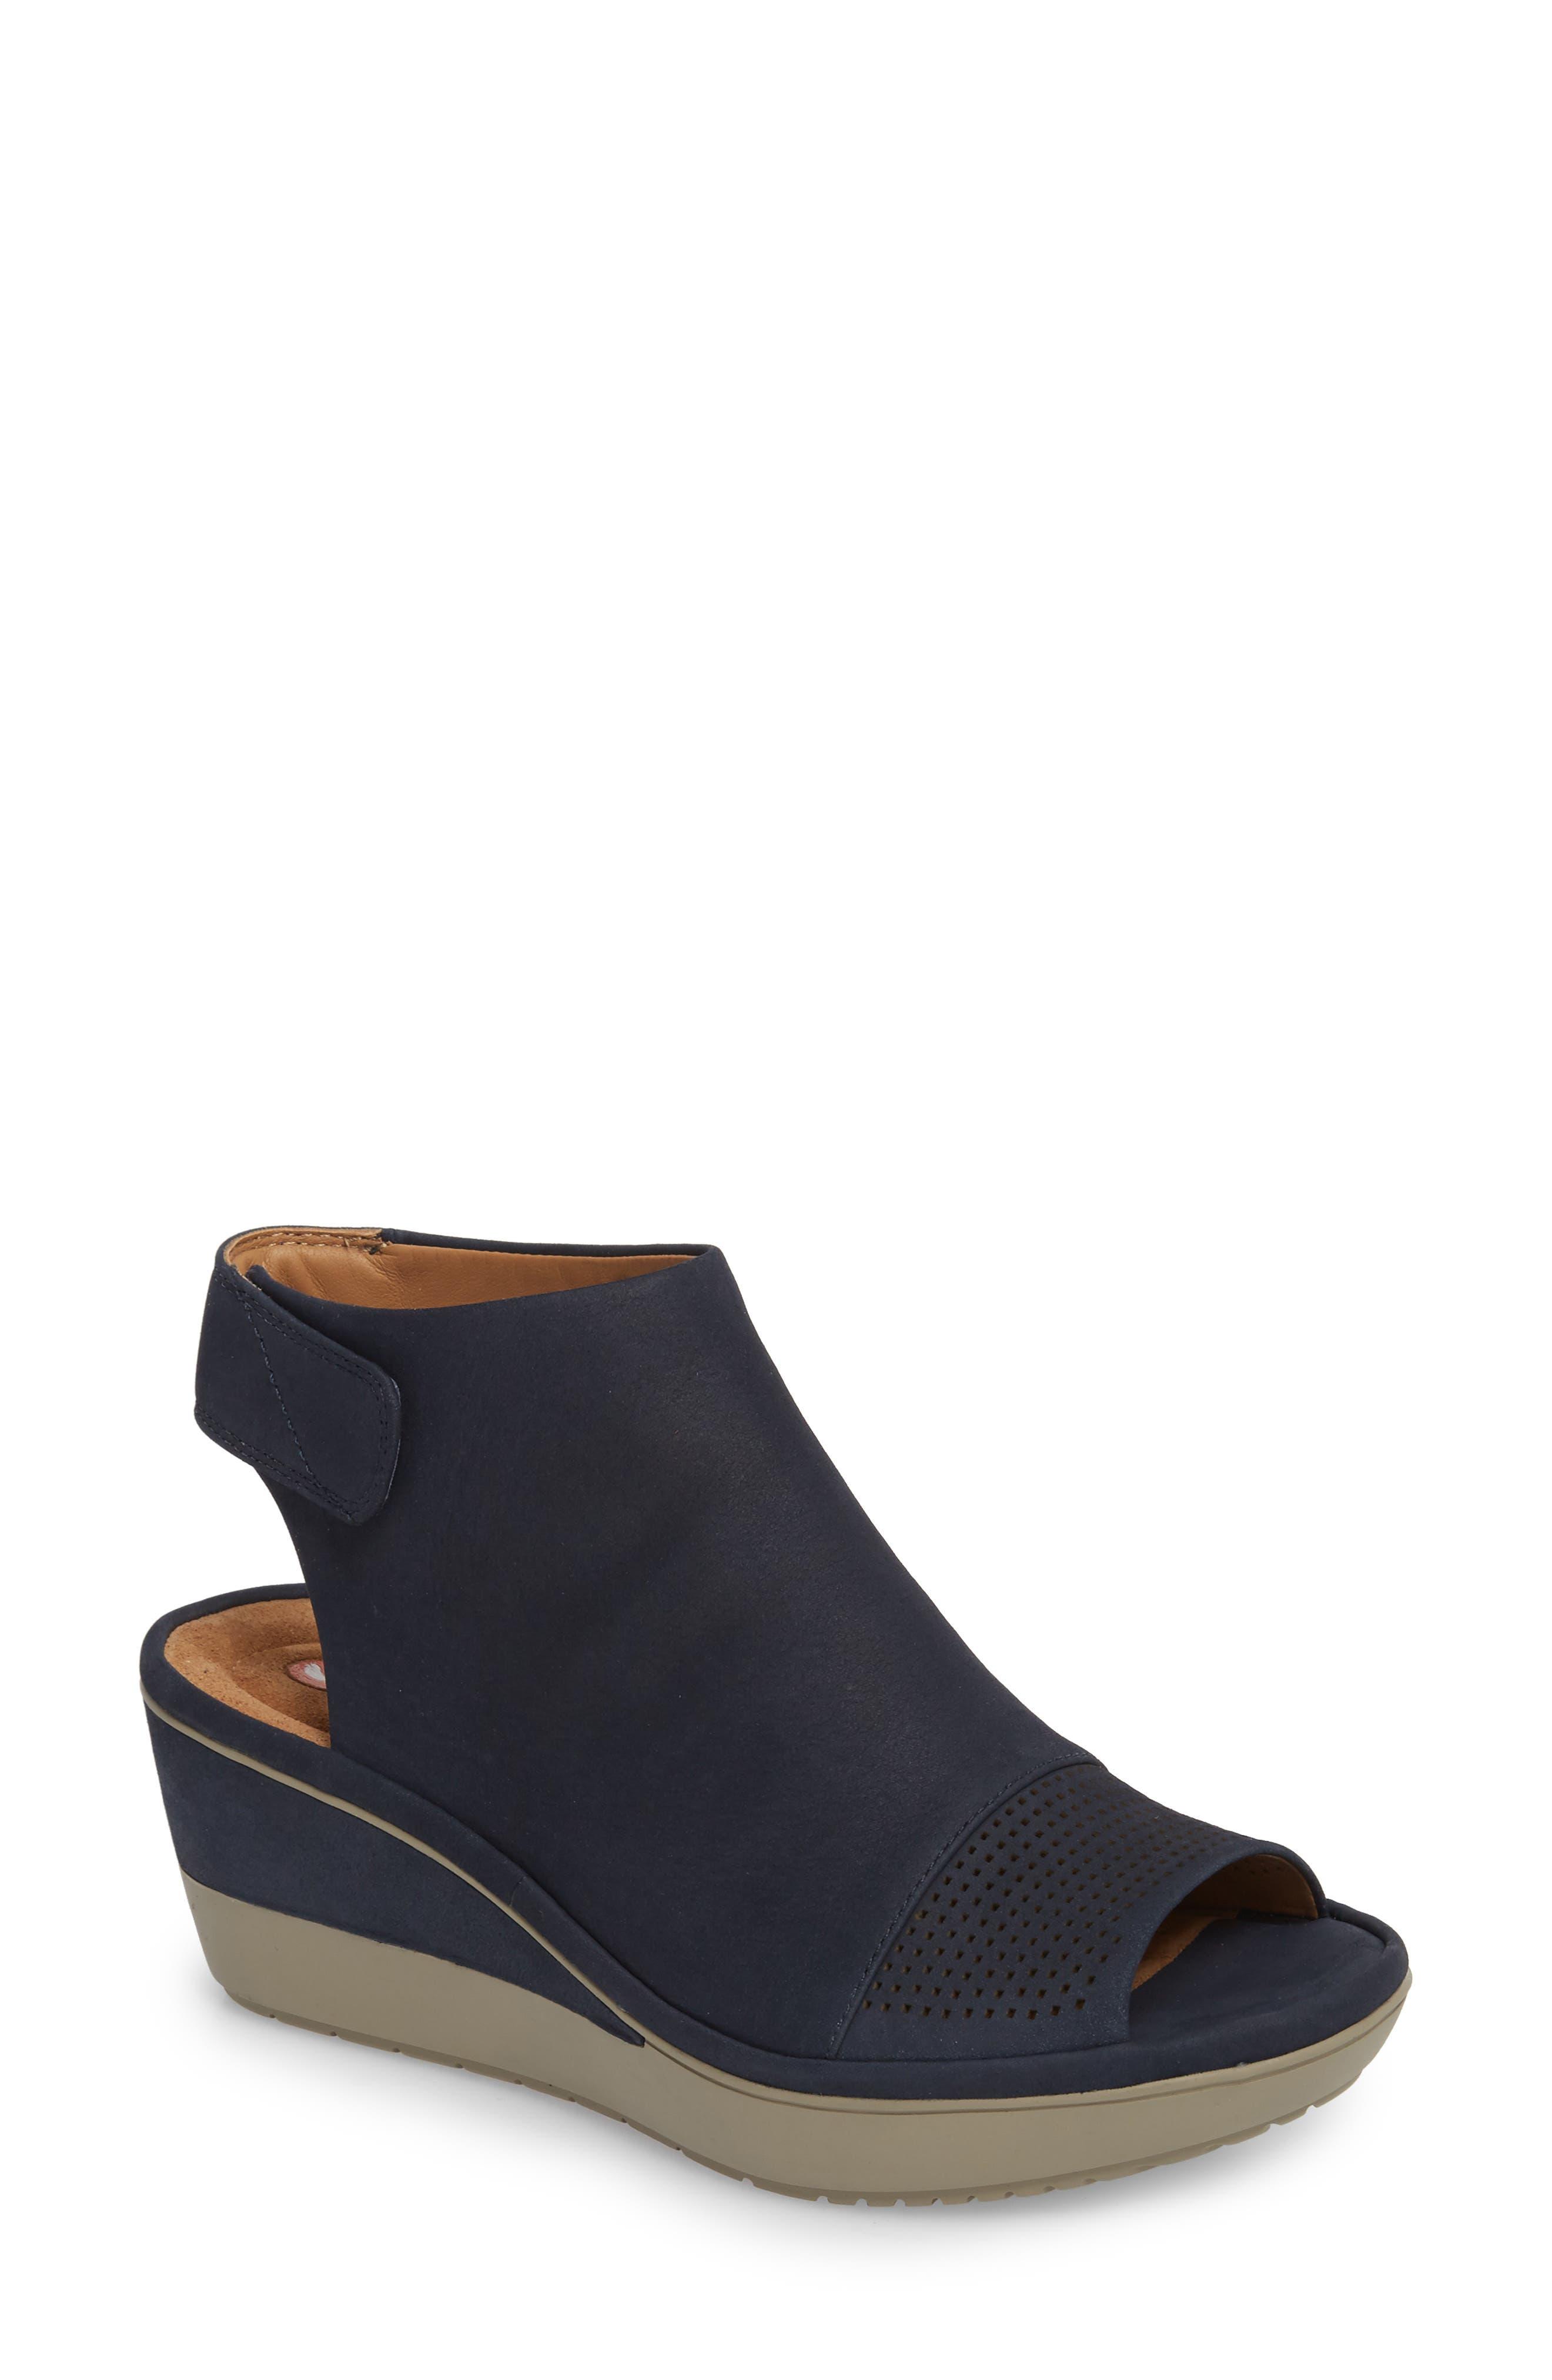 Wynnmere Abie Wedge Sandal,                         Main,                         color, Navy Nubuck